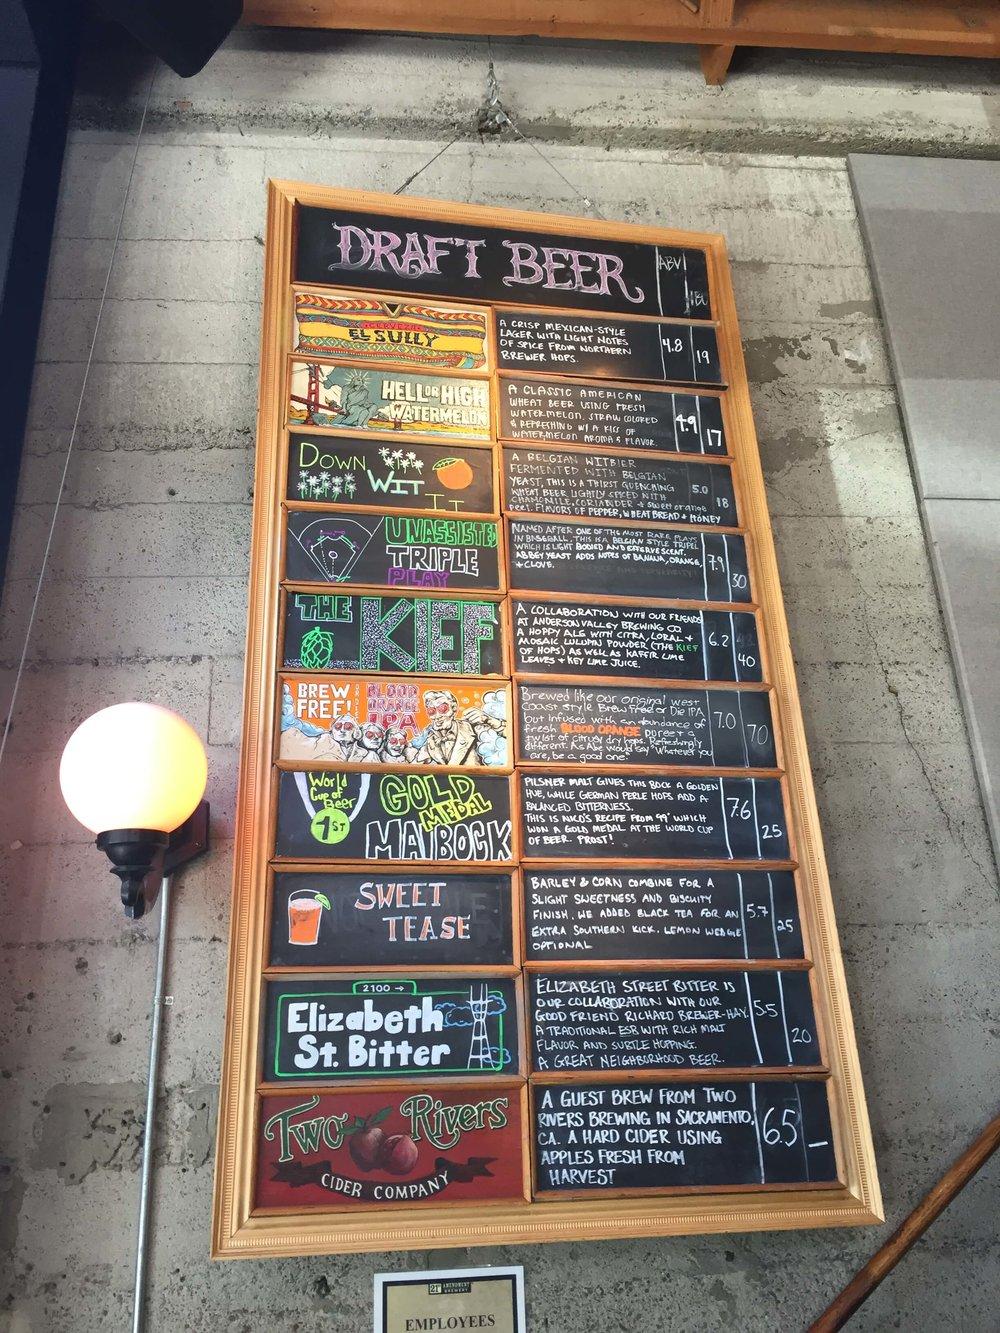 21st Amendment Beer List